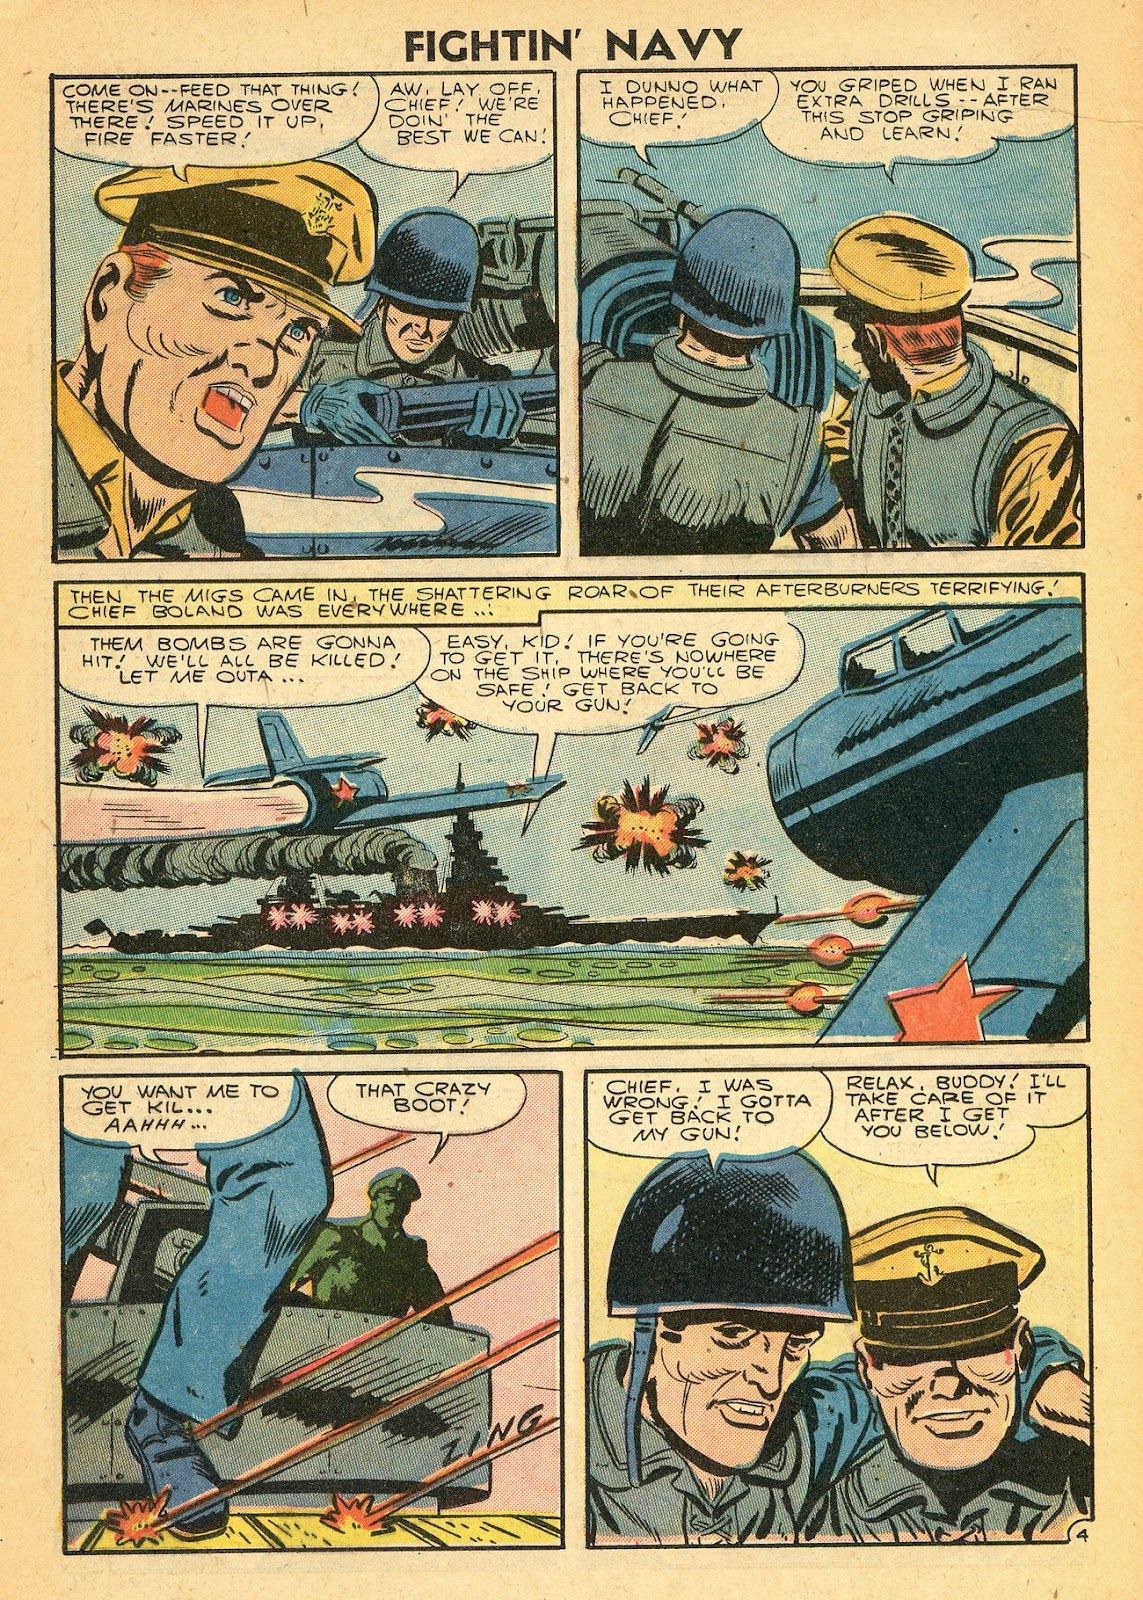 Read online Fightin' Navy comic -  Issue #77 - 13